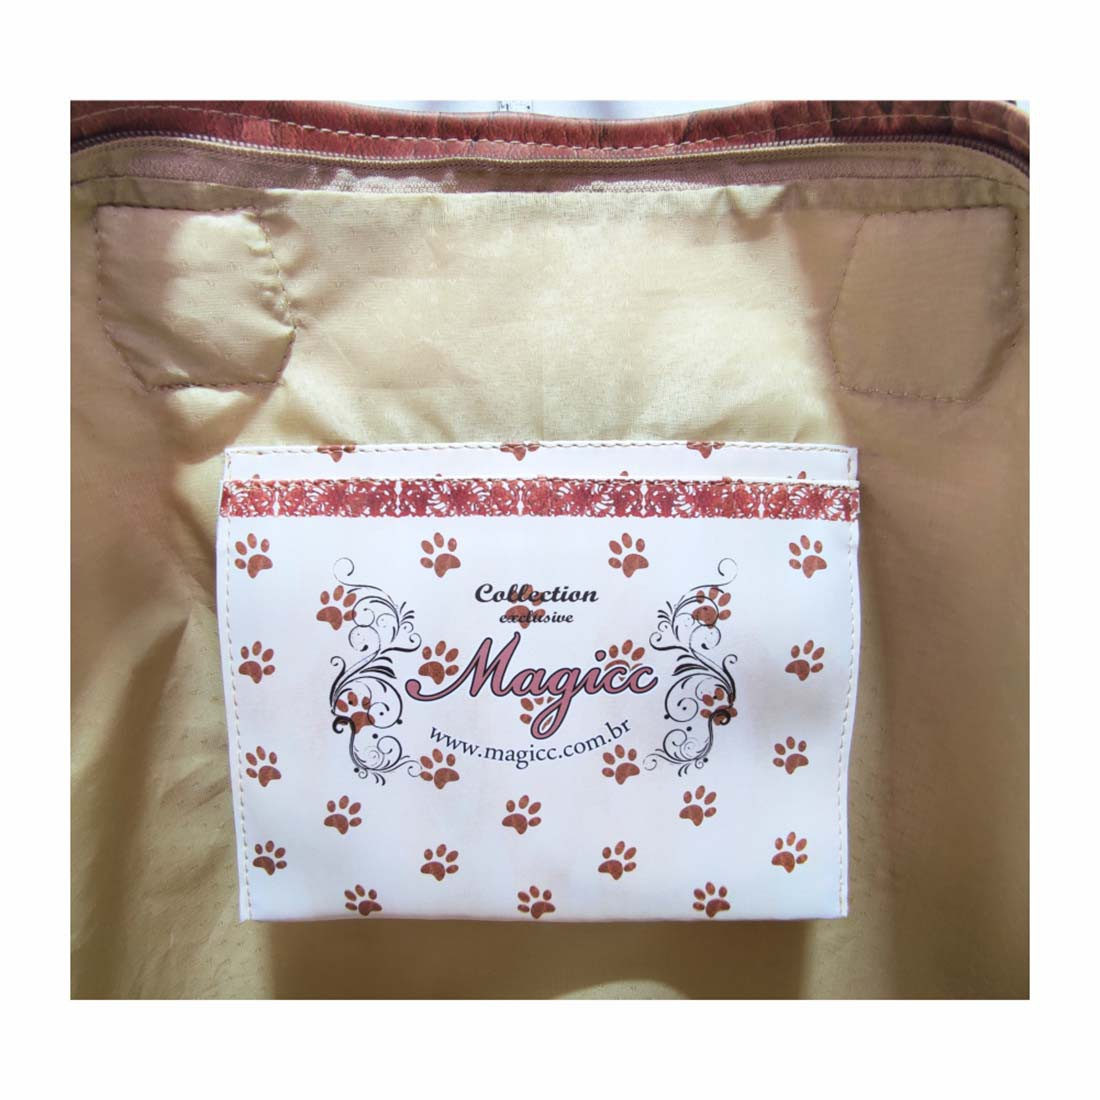 Bolsa Pet Feminina Cachorro com Chapéu, Magicc